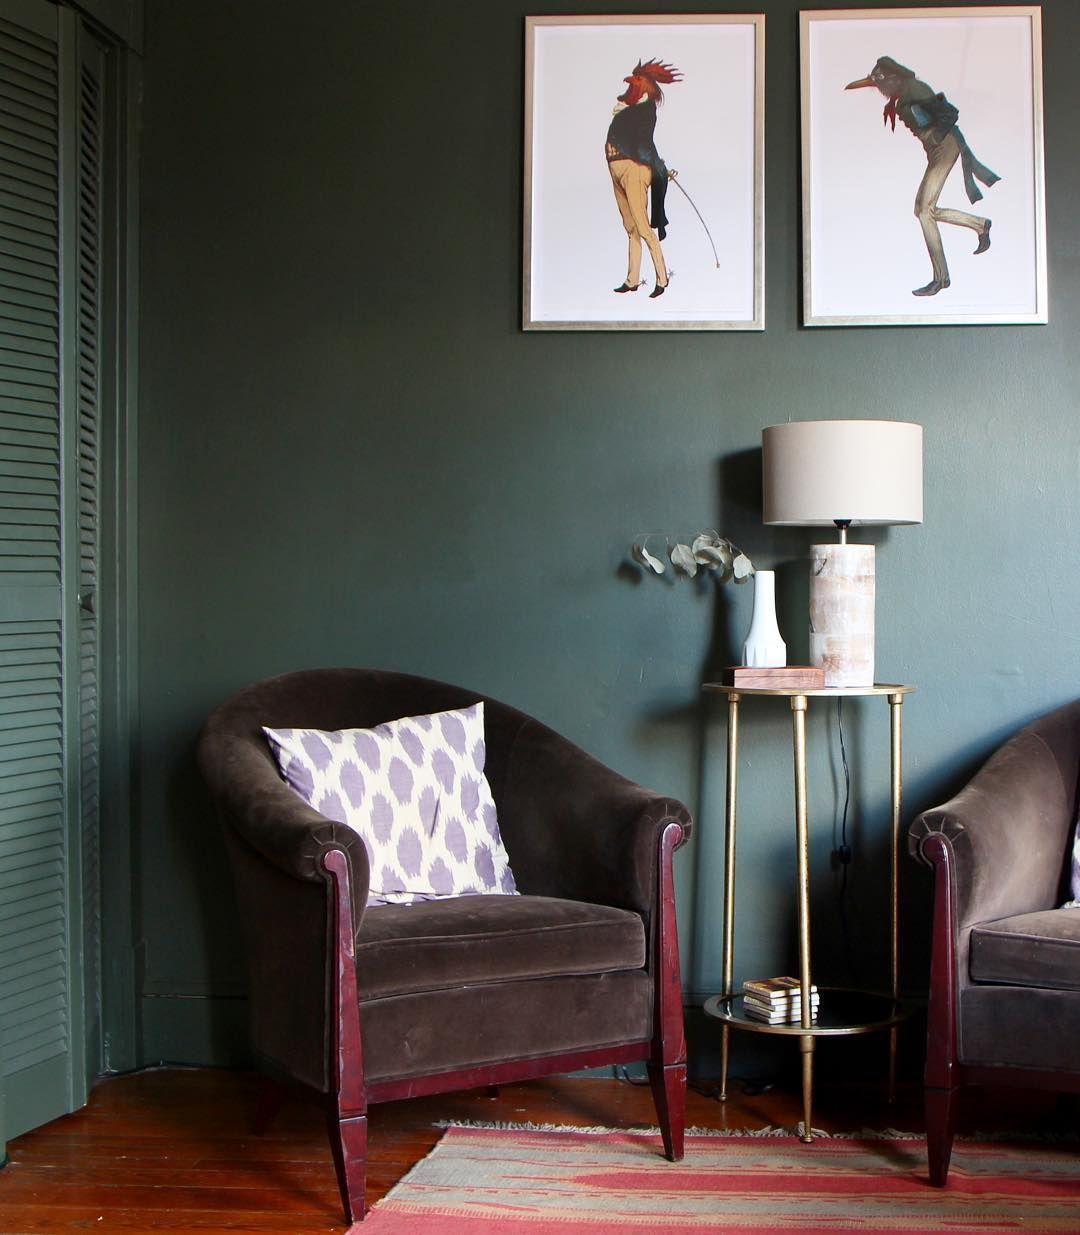 Benjamin Moore Vintage Vogue Living room paint, Green